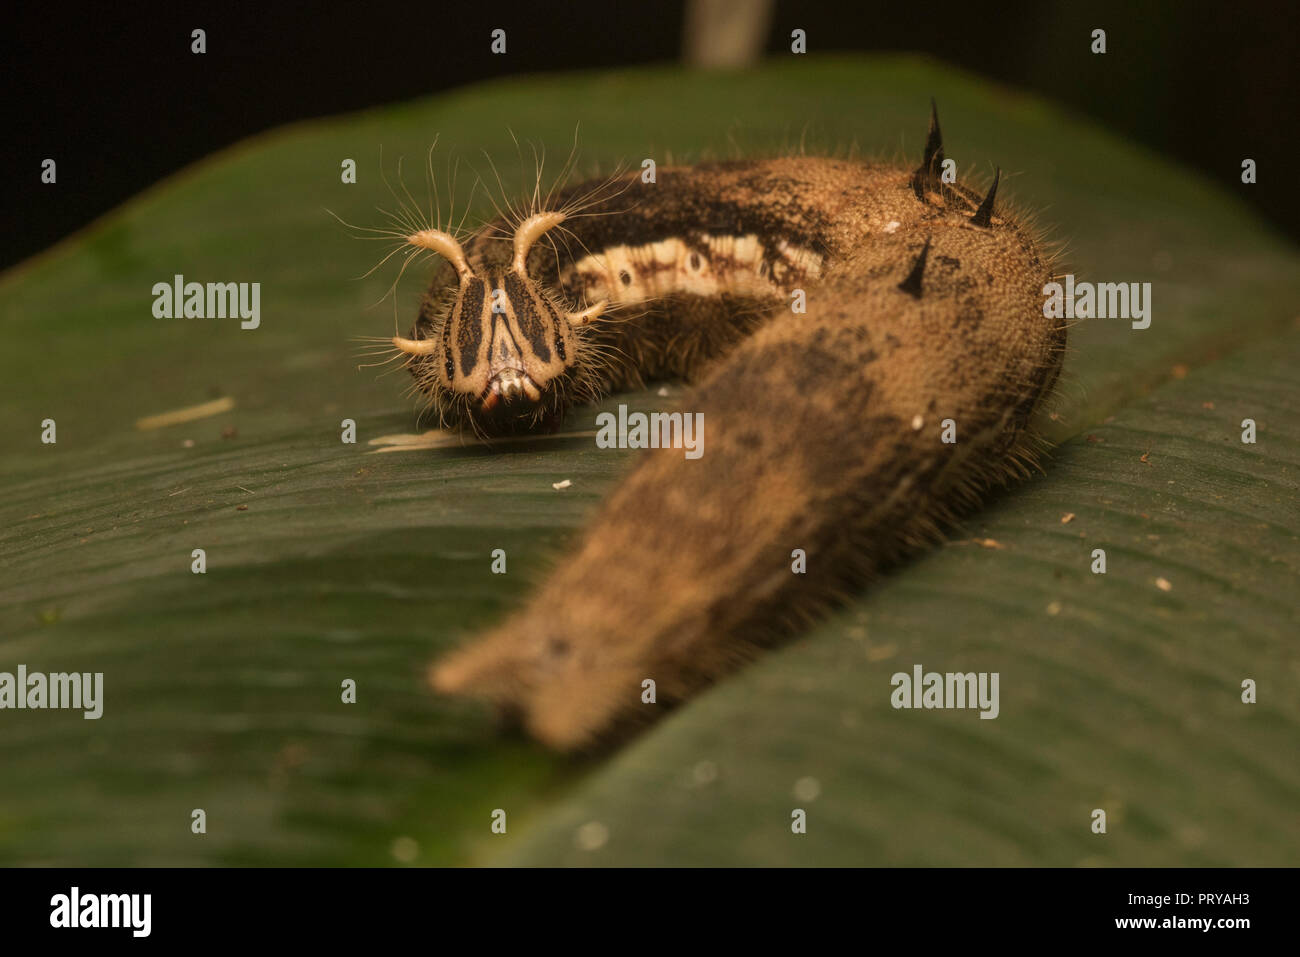 A owl butterfly (Caligo sp) caterpillar from Manu National Park in tropical Peru. - Stock Image